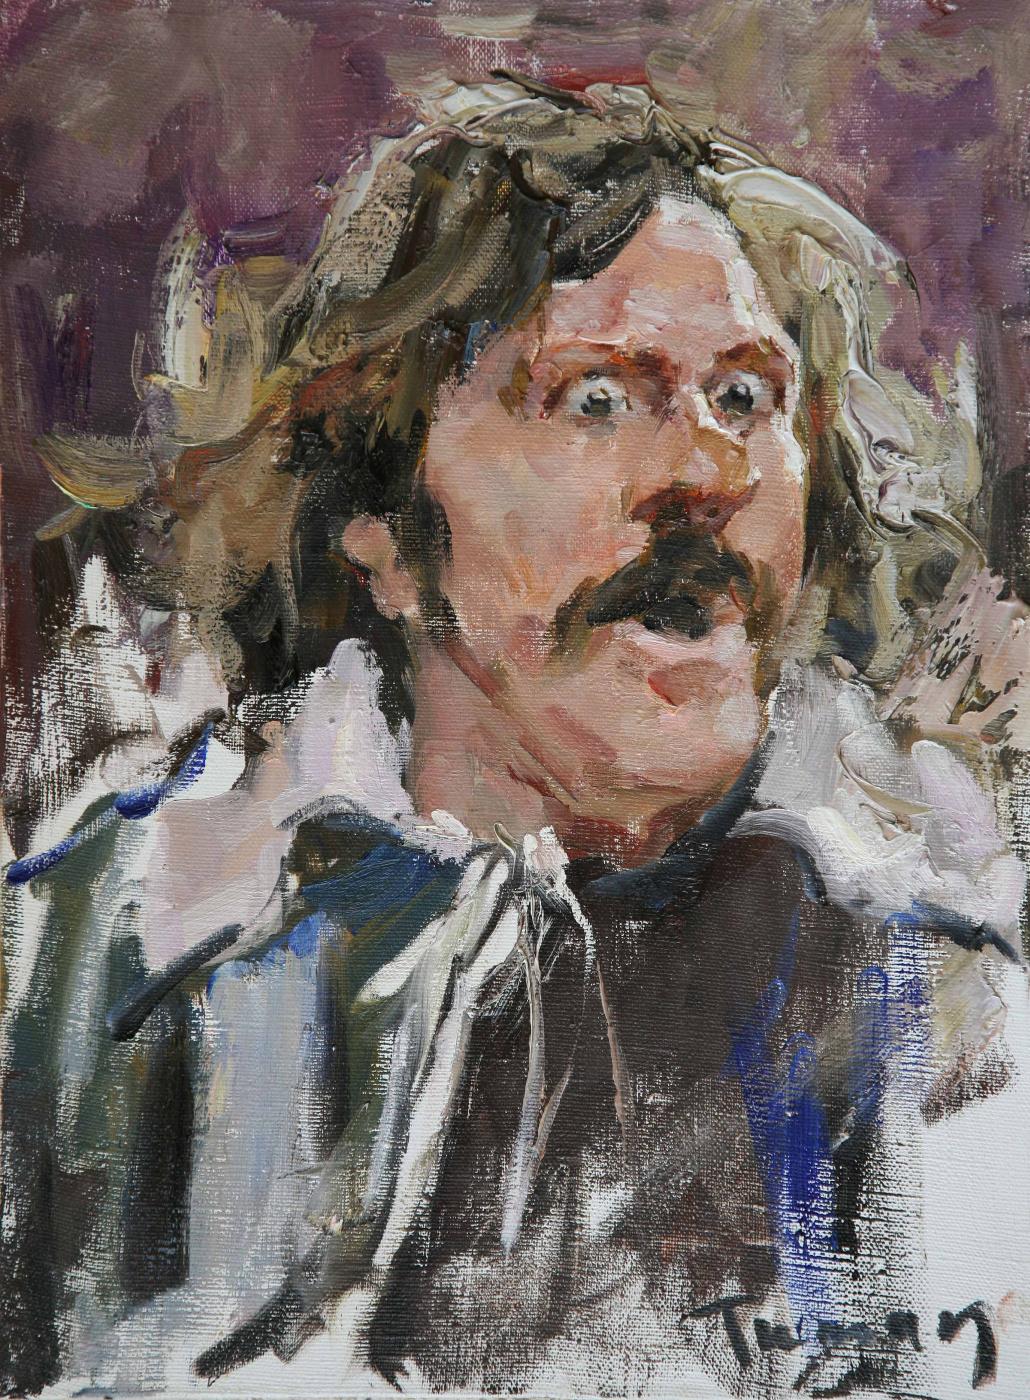 Tuman Art Gallery Tumana Zhumabayeva. Gerard Depardieu